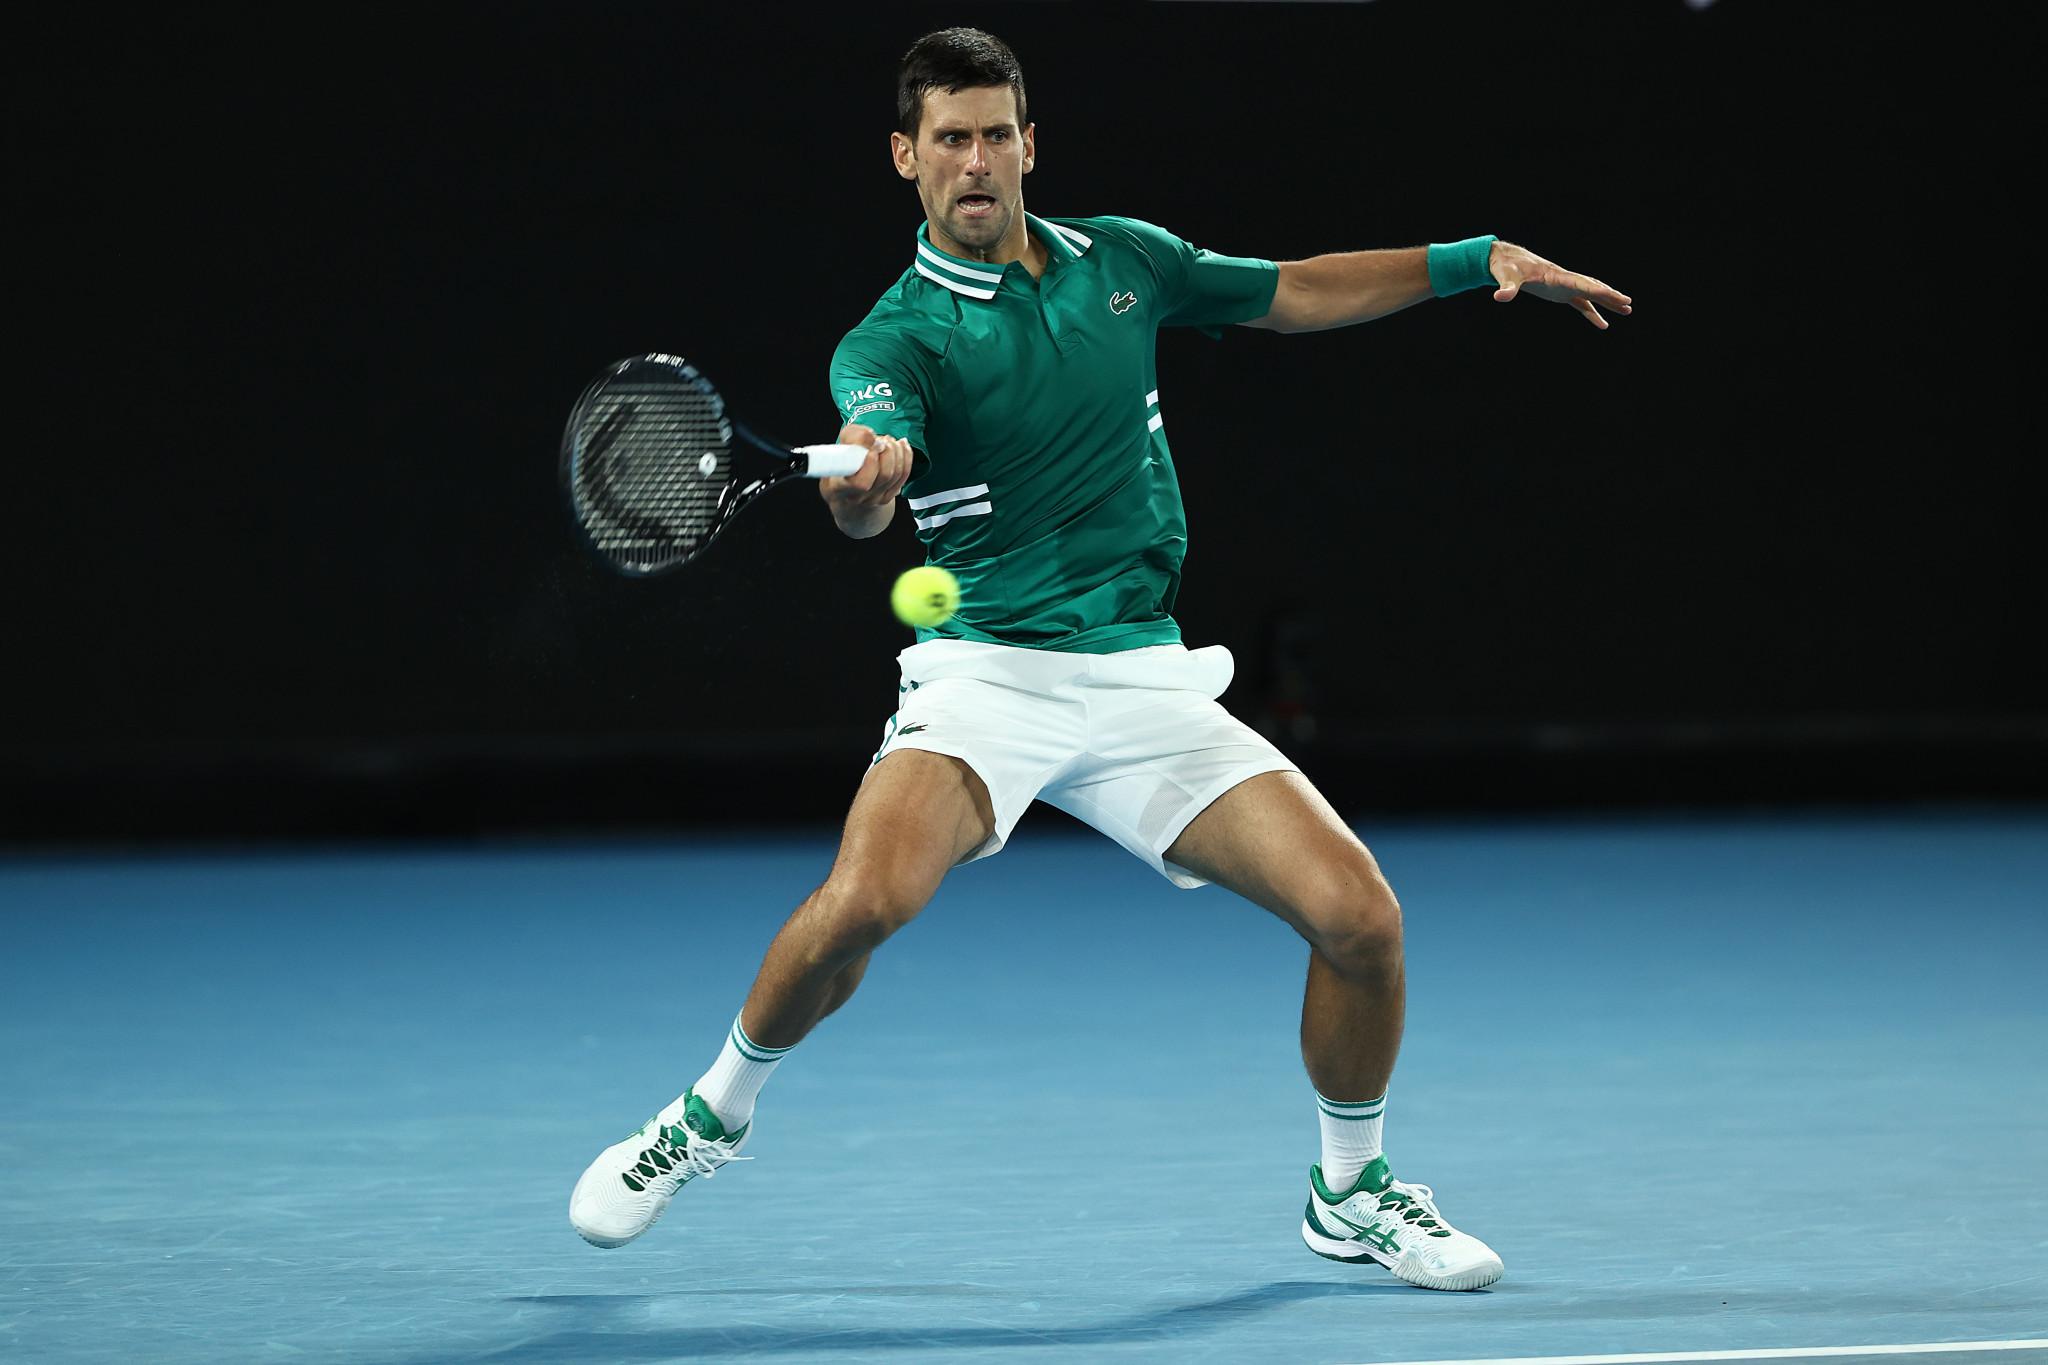 Djokovic fights back against Zverev to reach Australian Open semi-finals